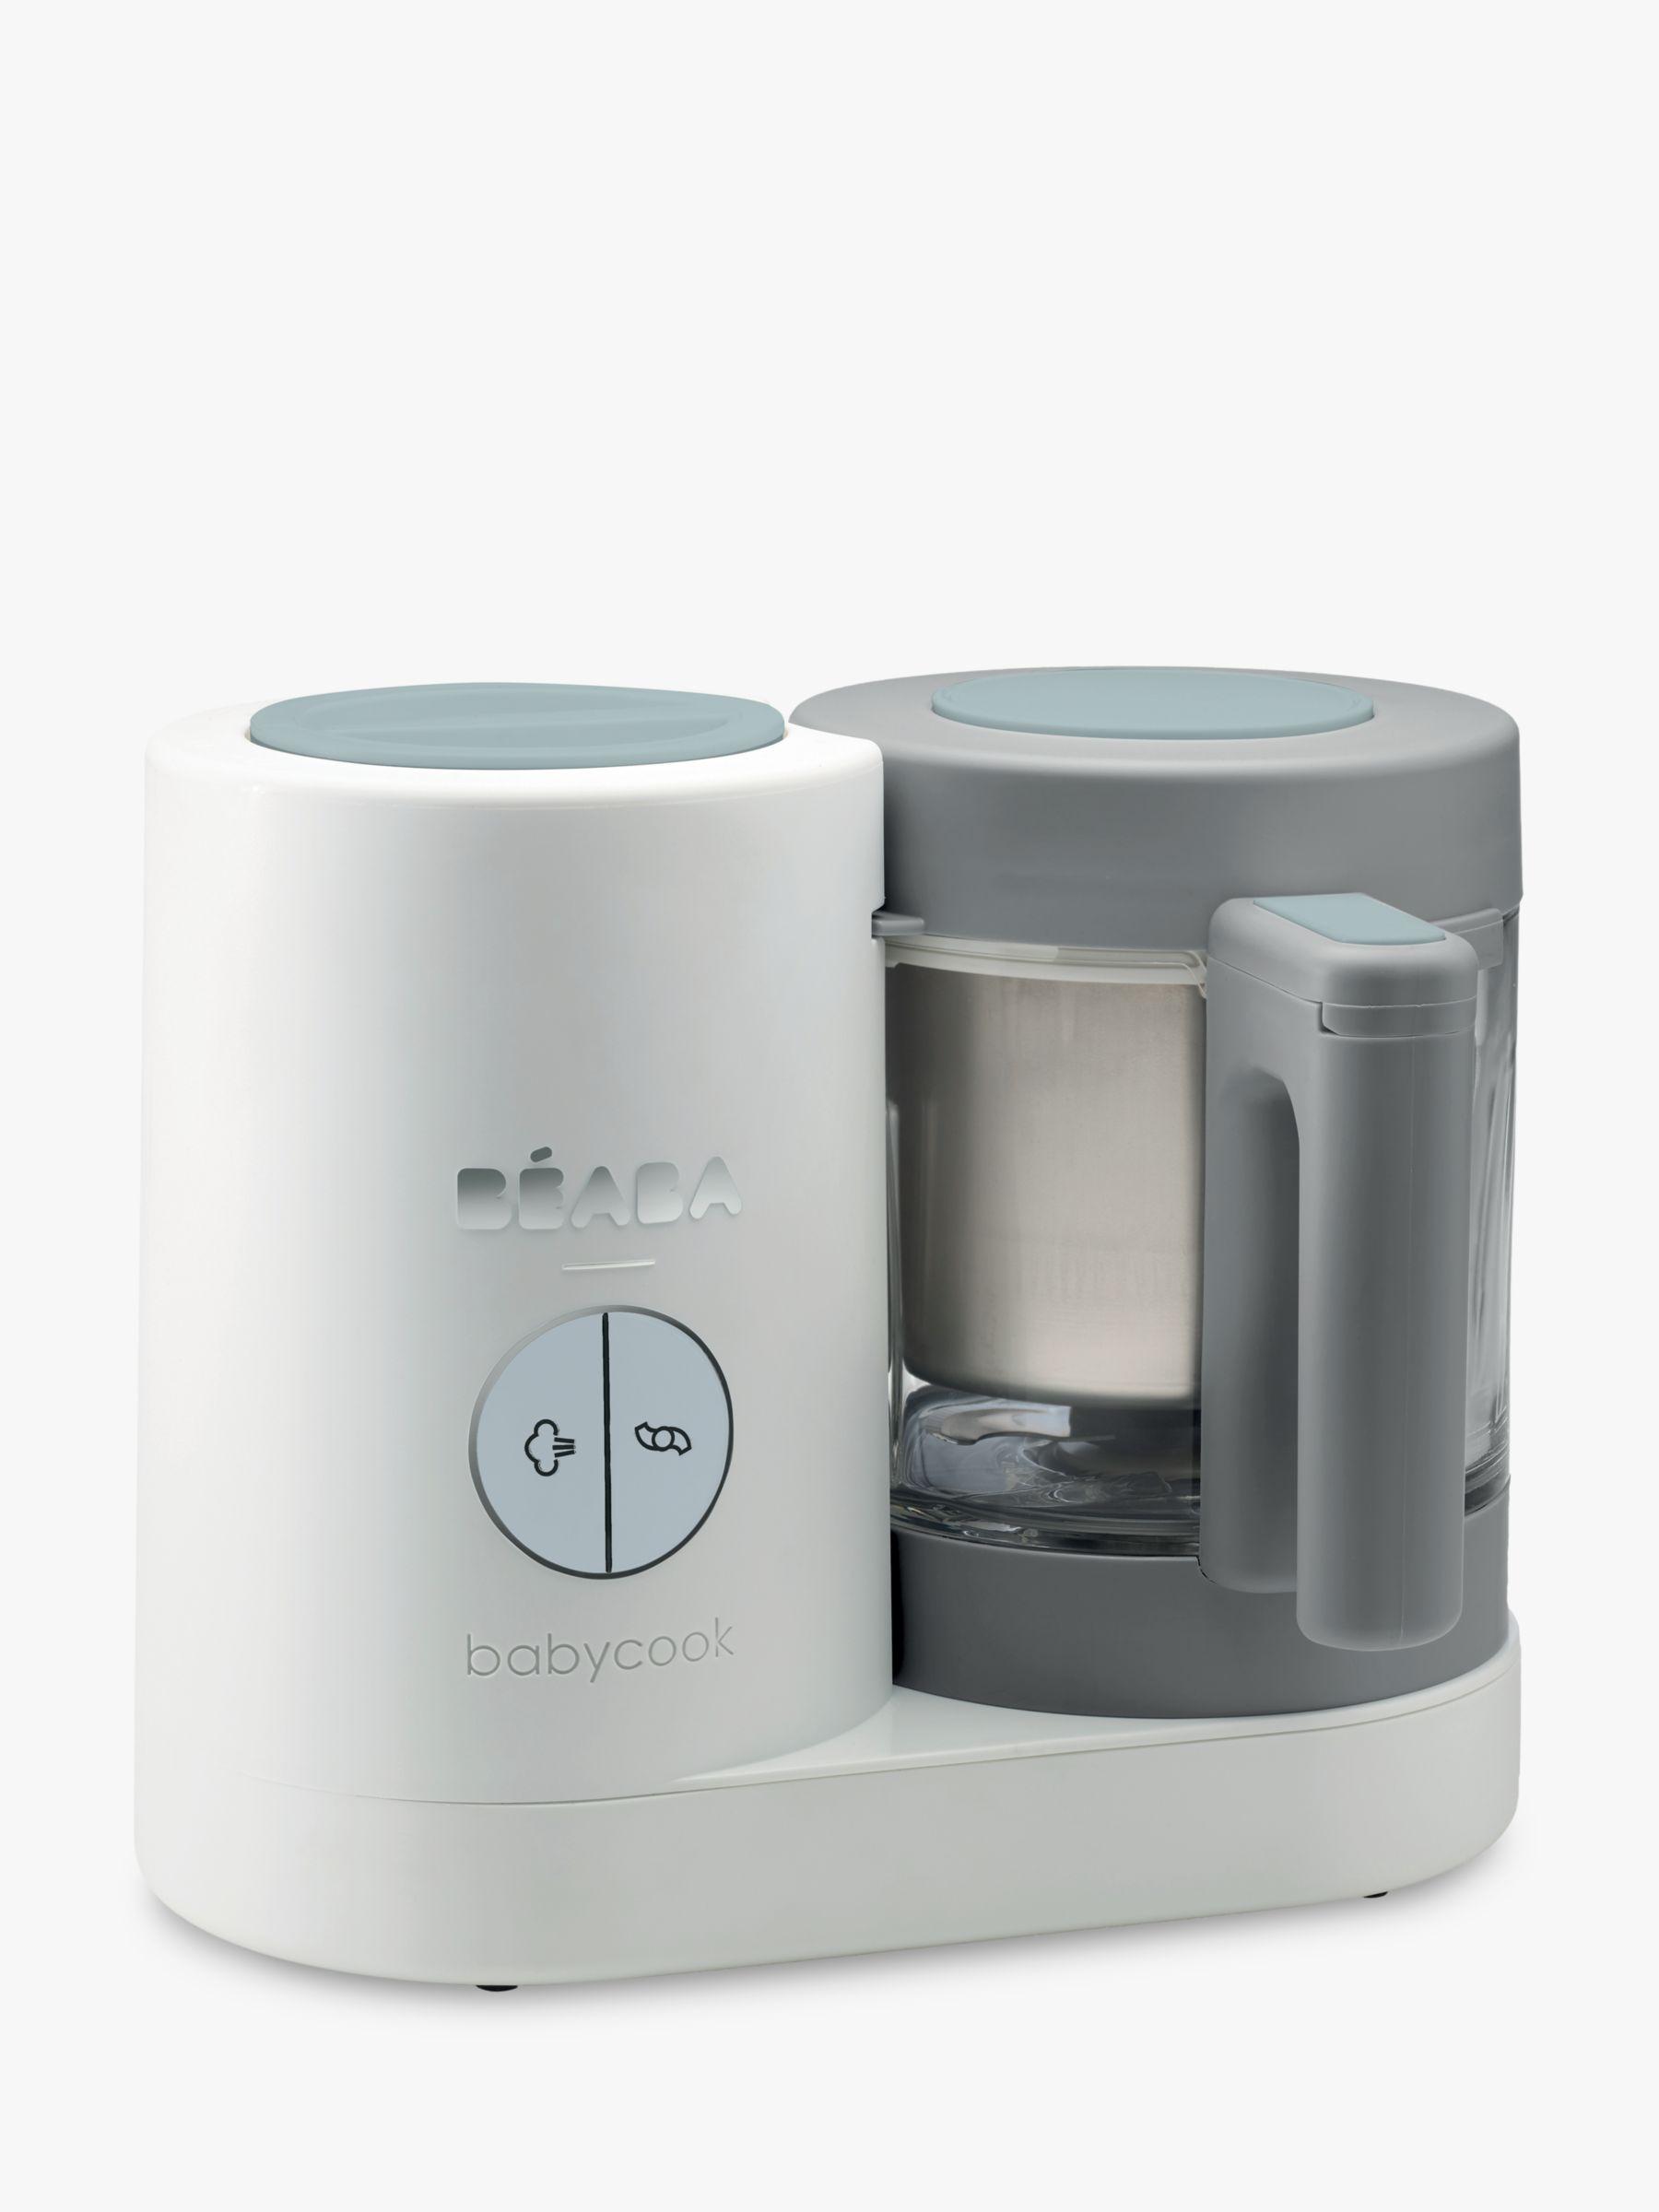 Beaba Beaba Babycook Neo Food Processor, Grey/White